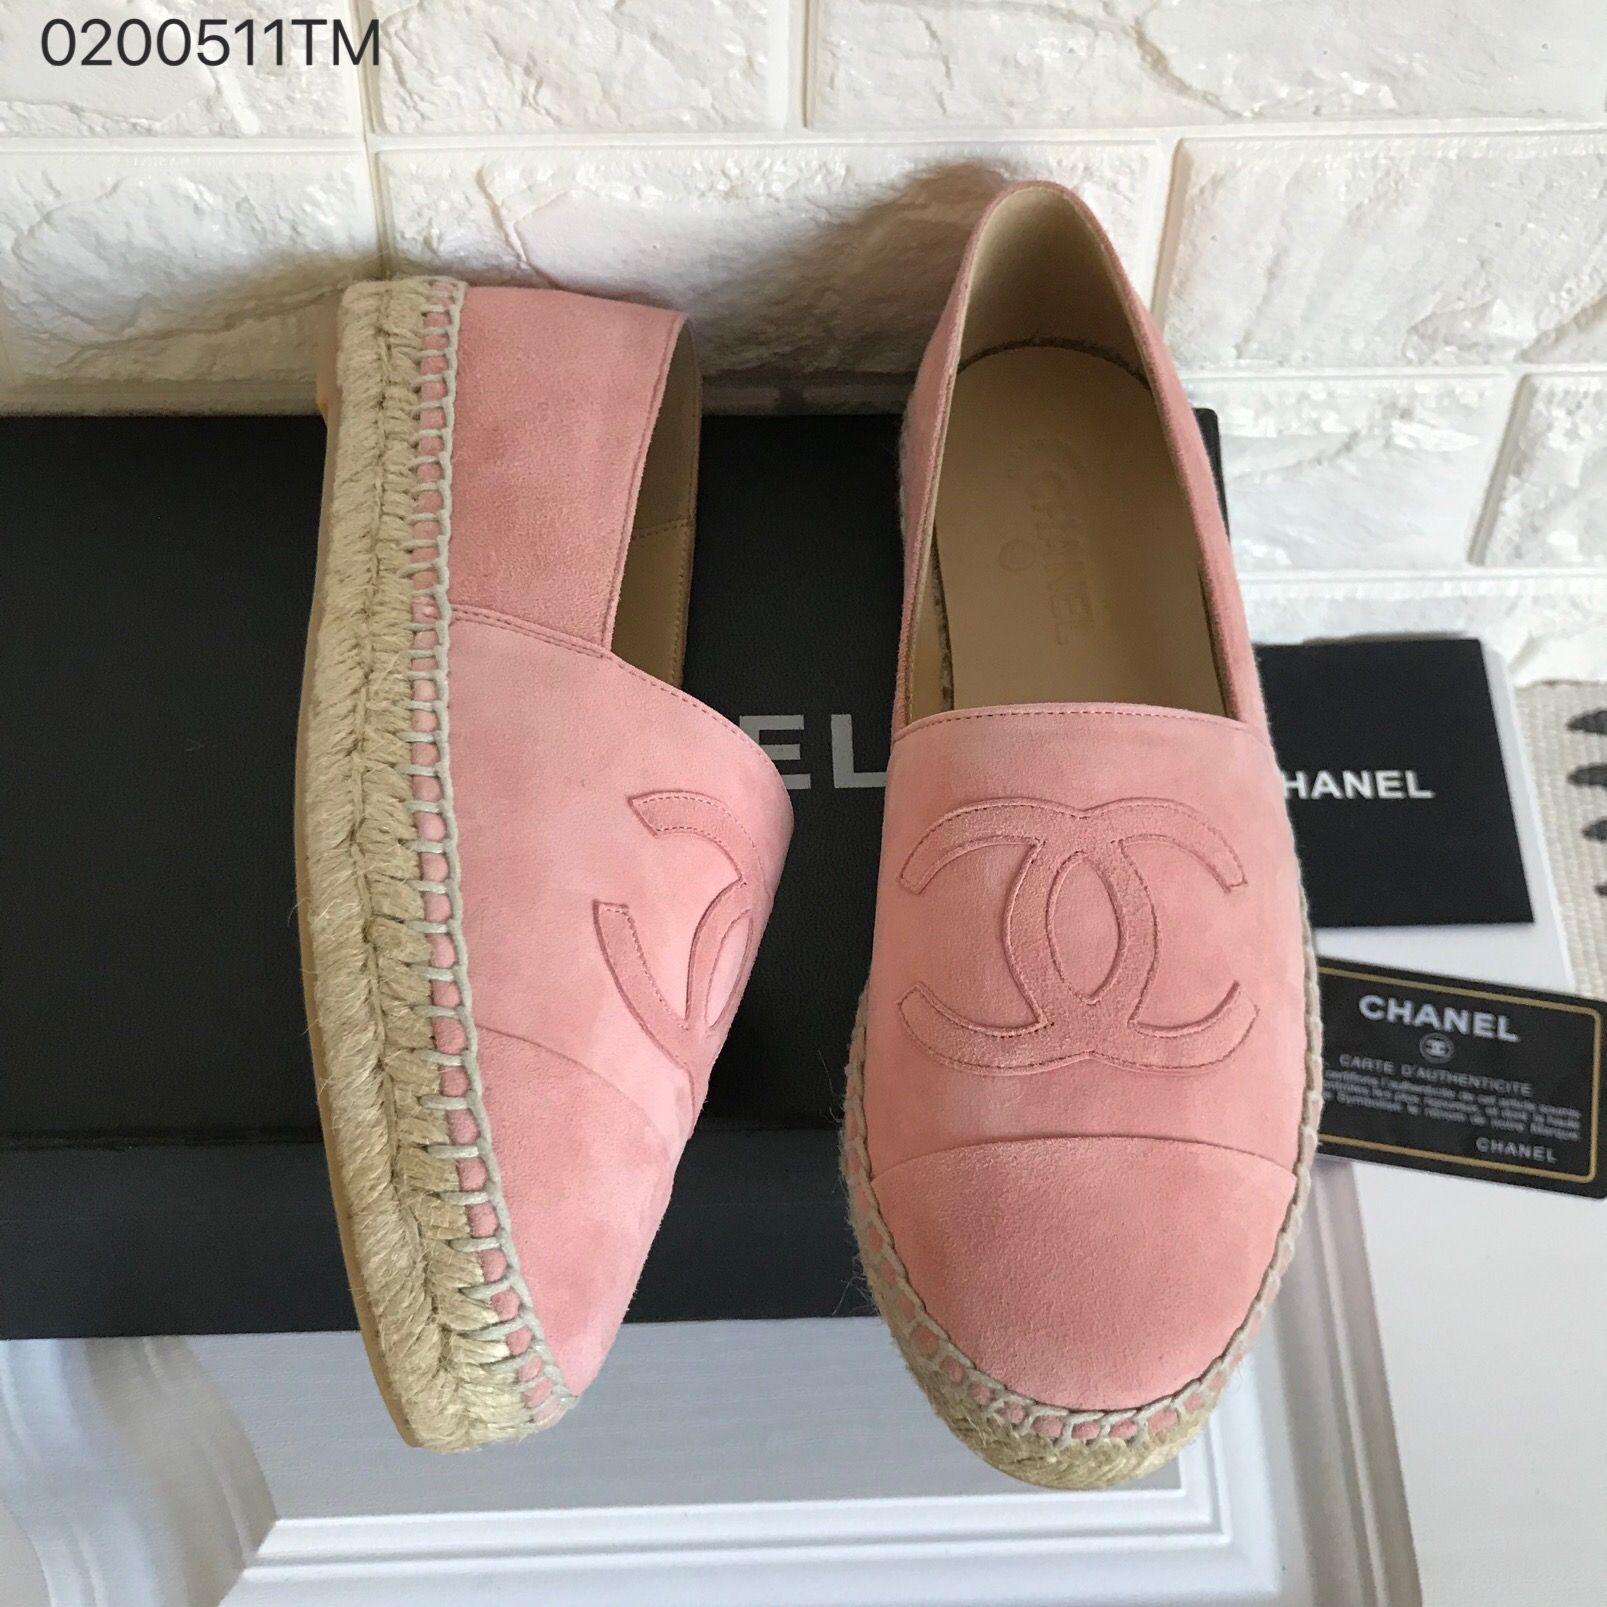 Fashion shoes, Chanel shoes flats